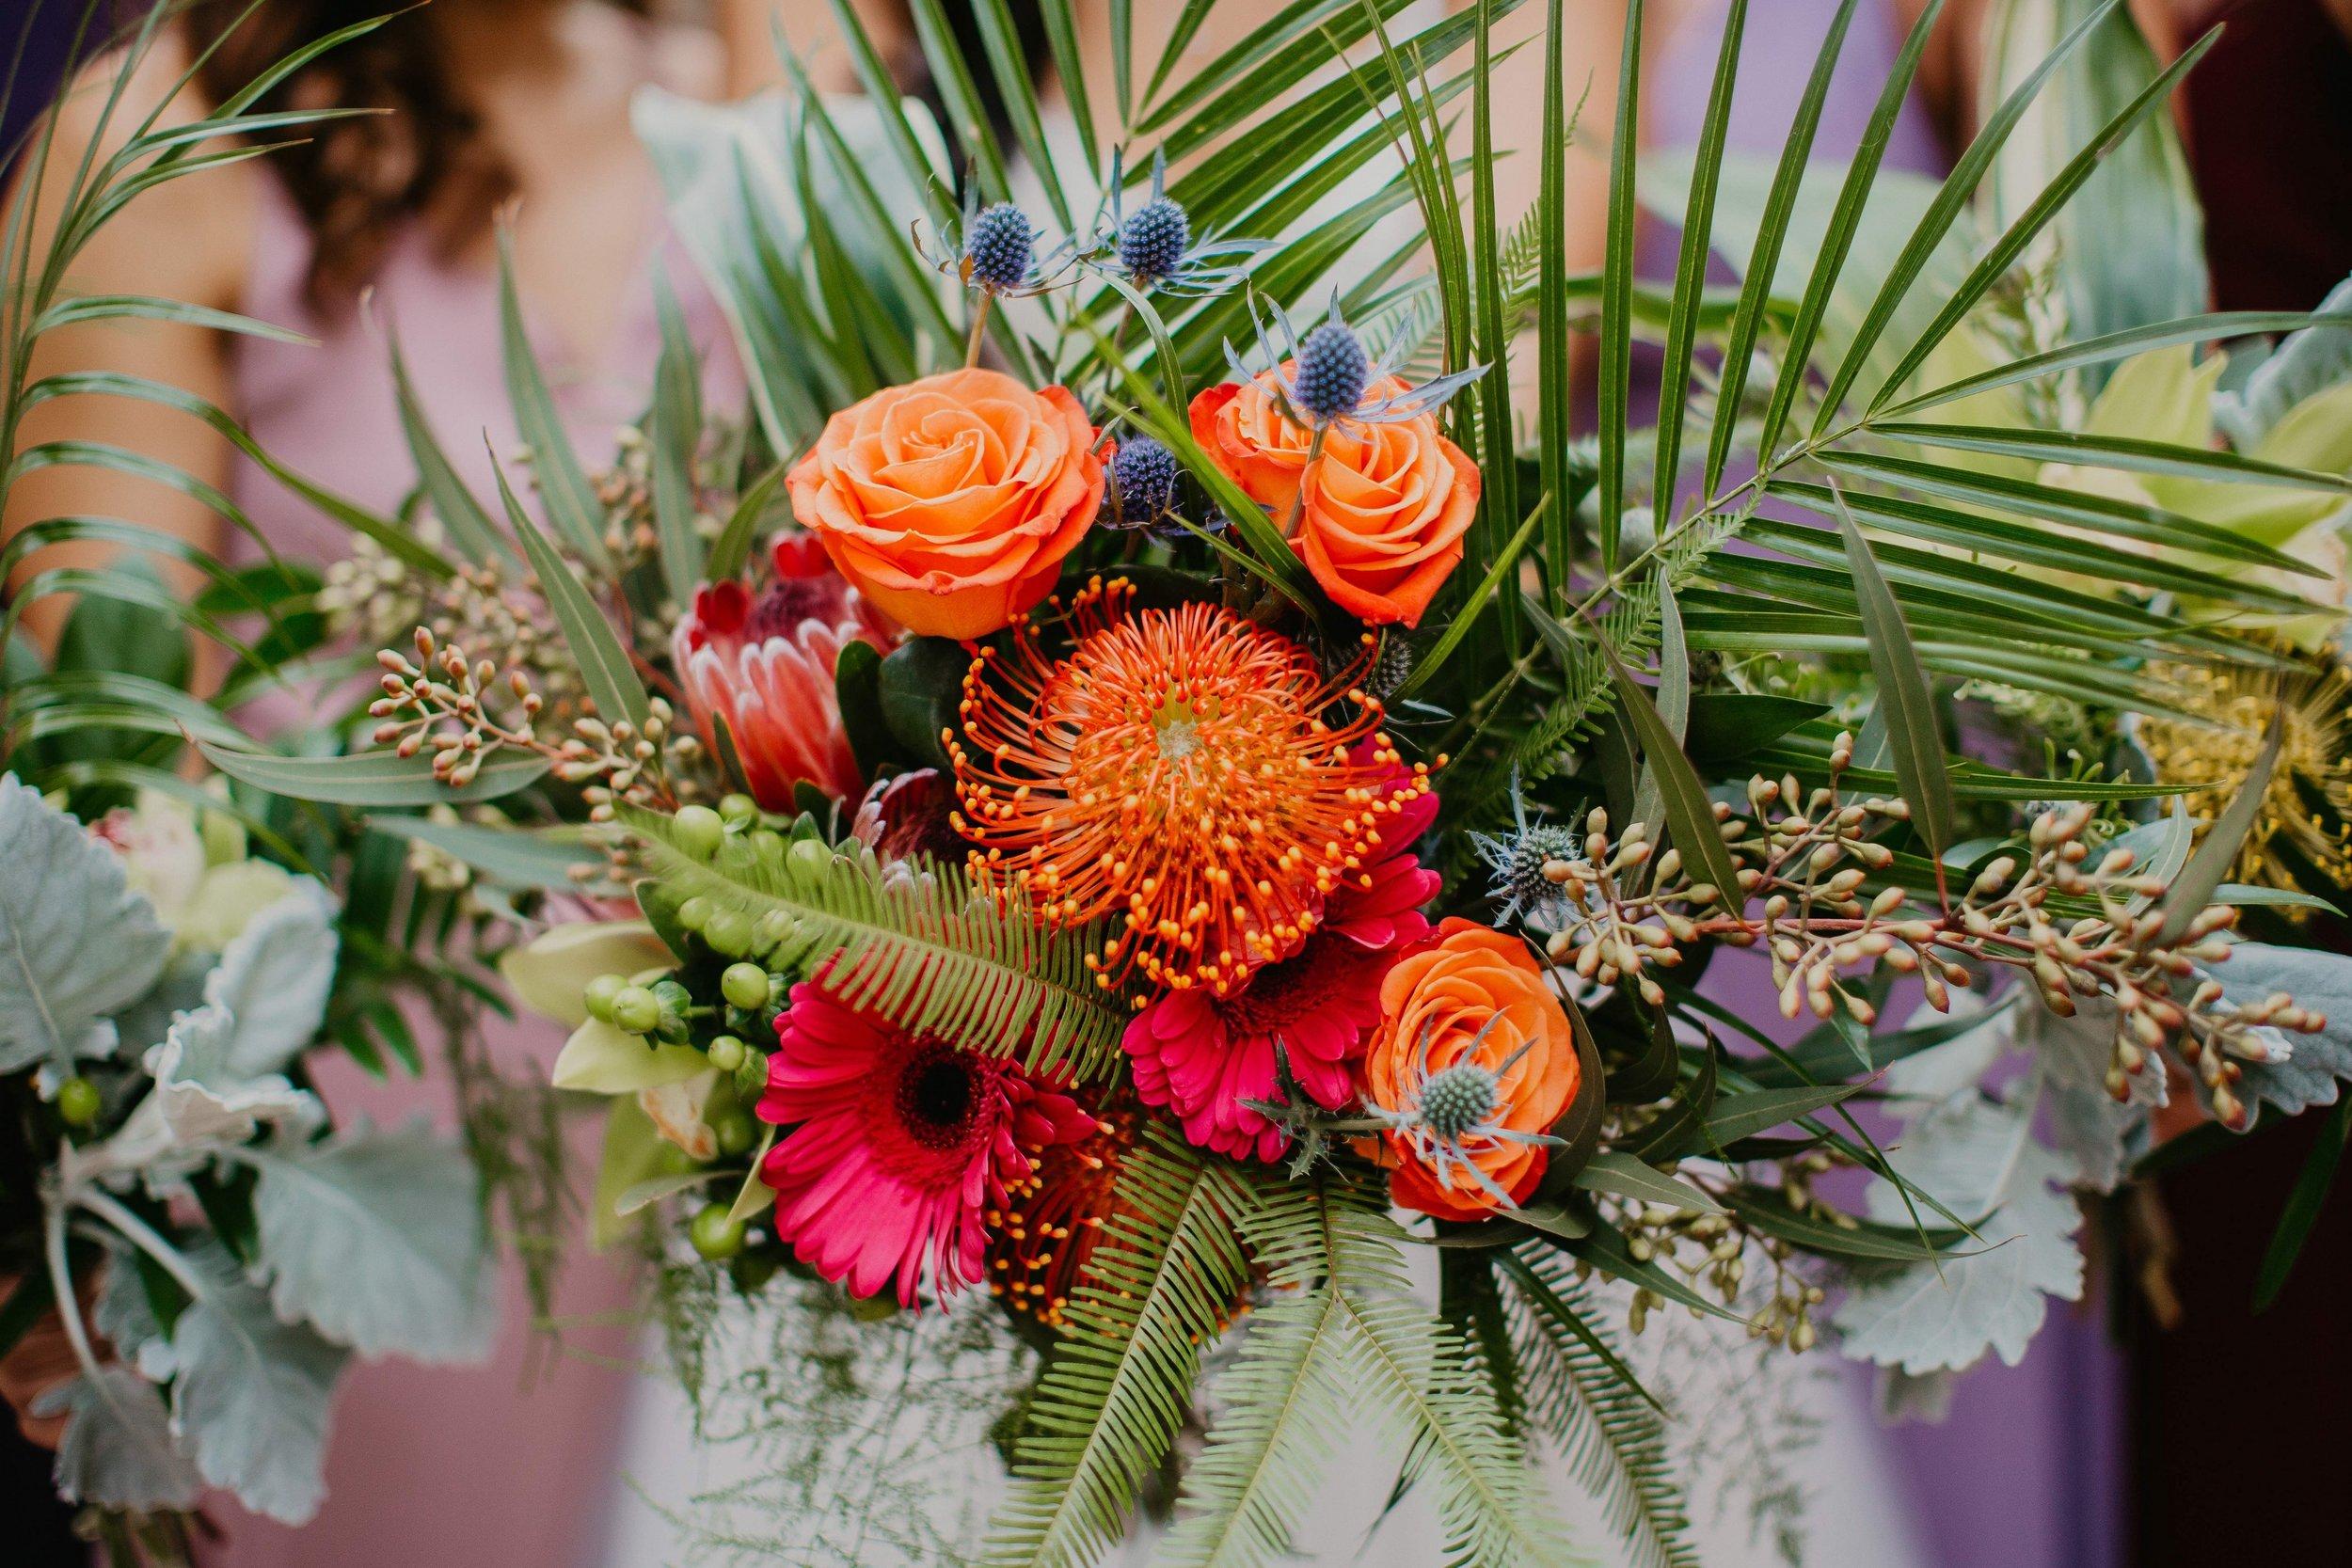 www.santabarbarawedding.com | Candice Marie Photography | Hilton Santa Barbara Beachfront Resort | Dalina Klan | Once in a Lifetime Weddings | Alpha Floral | Flower Bouquet